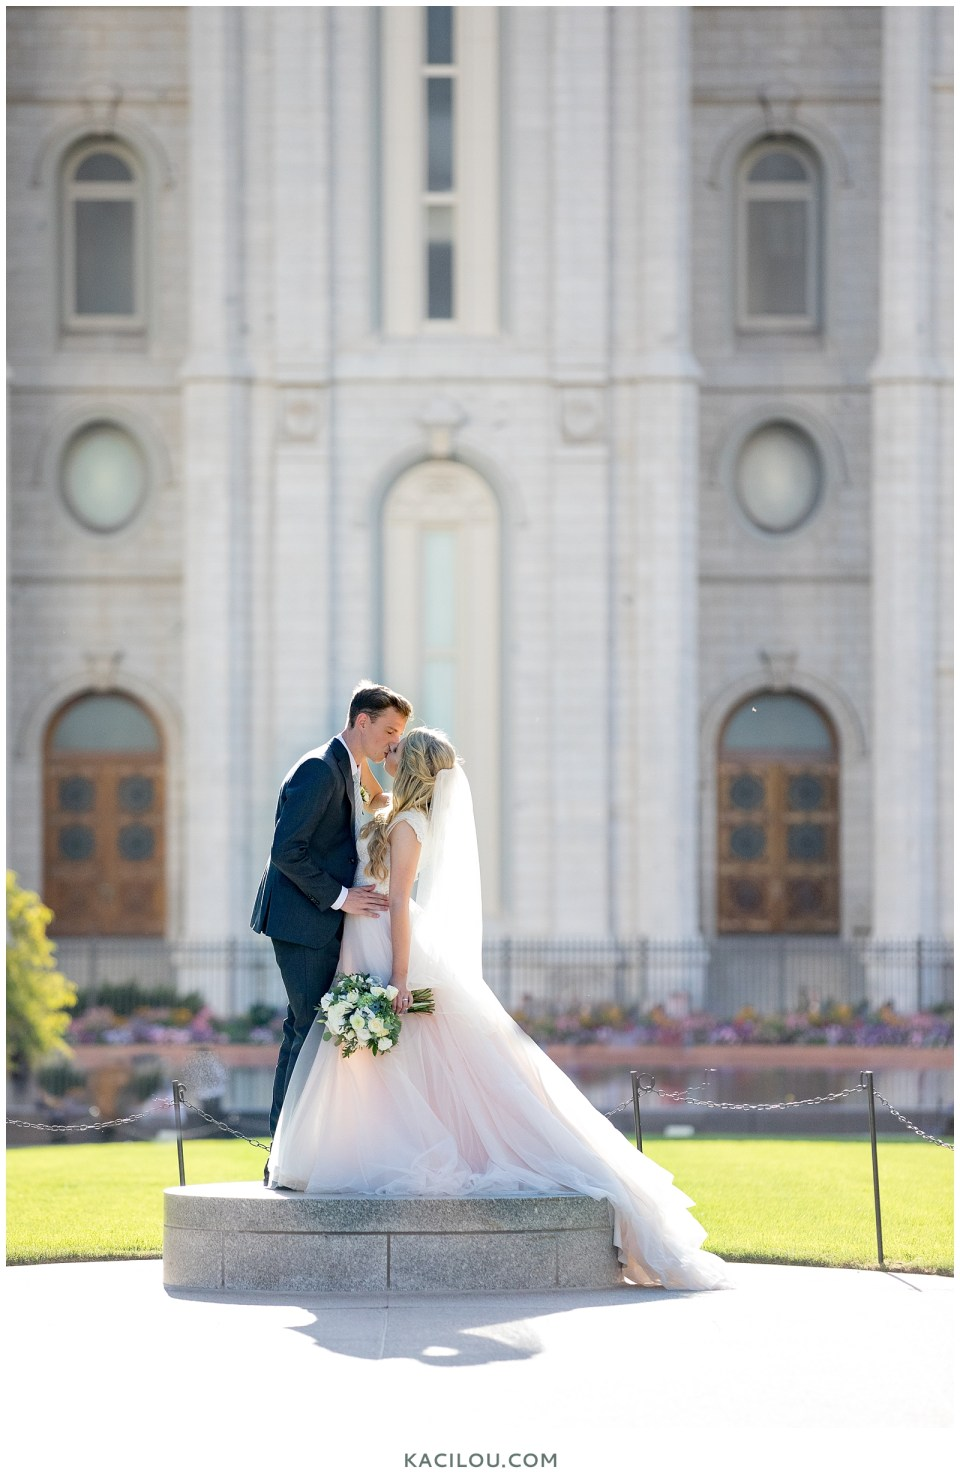 Salt Lake City Temple Wedding Photos by Kaci Lou Photography for Sam and Kennedy-7540.jpg